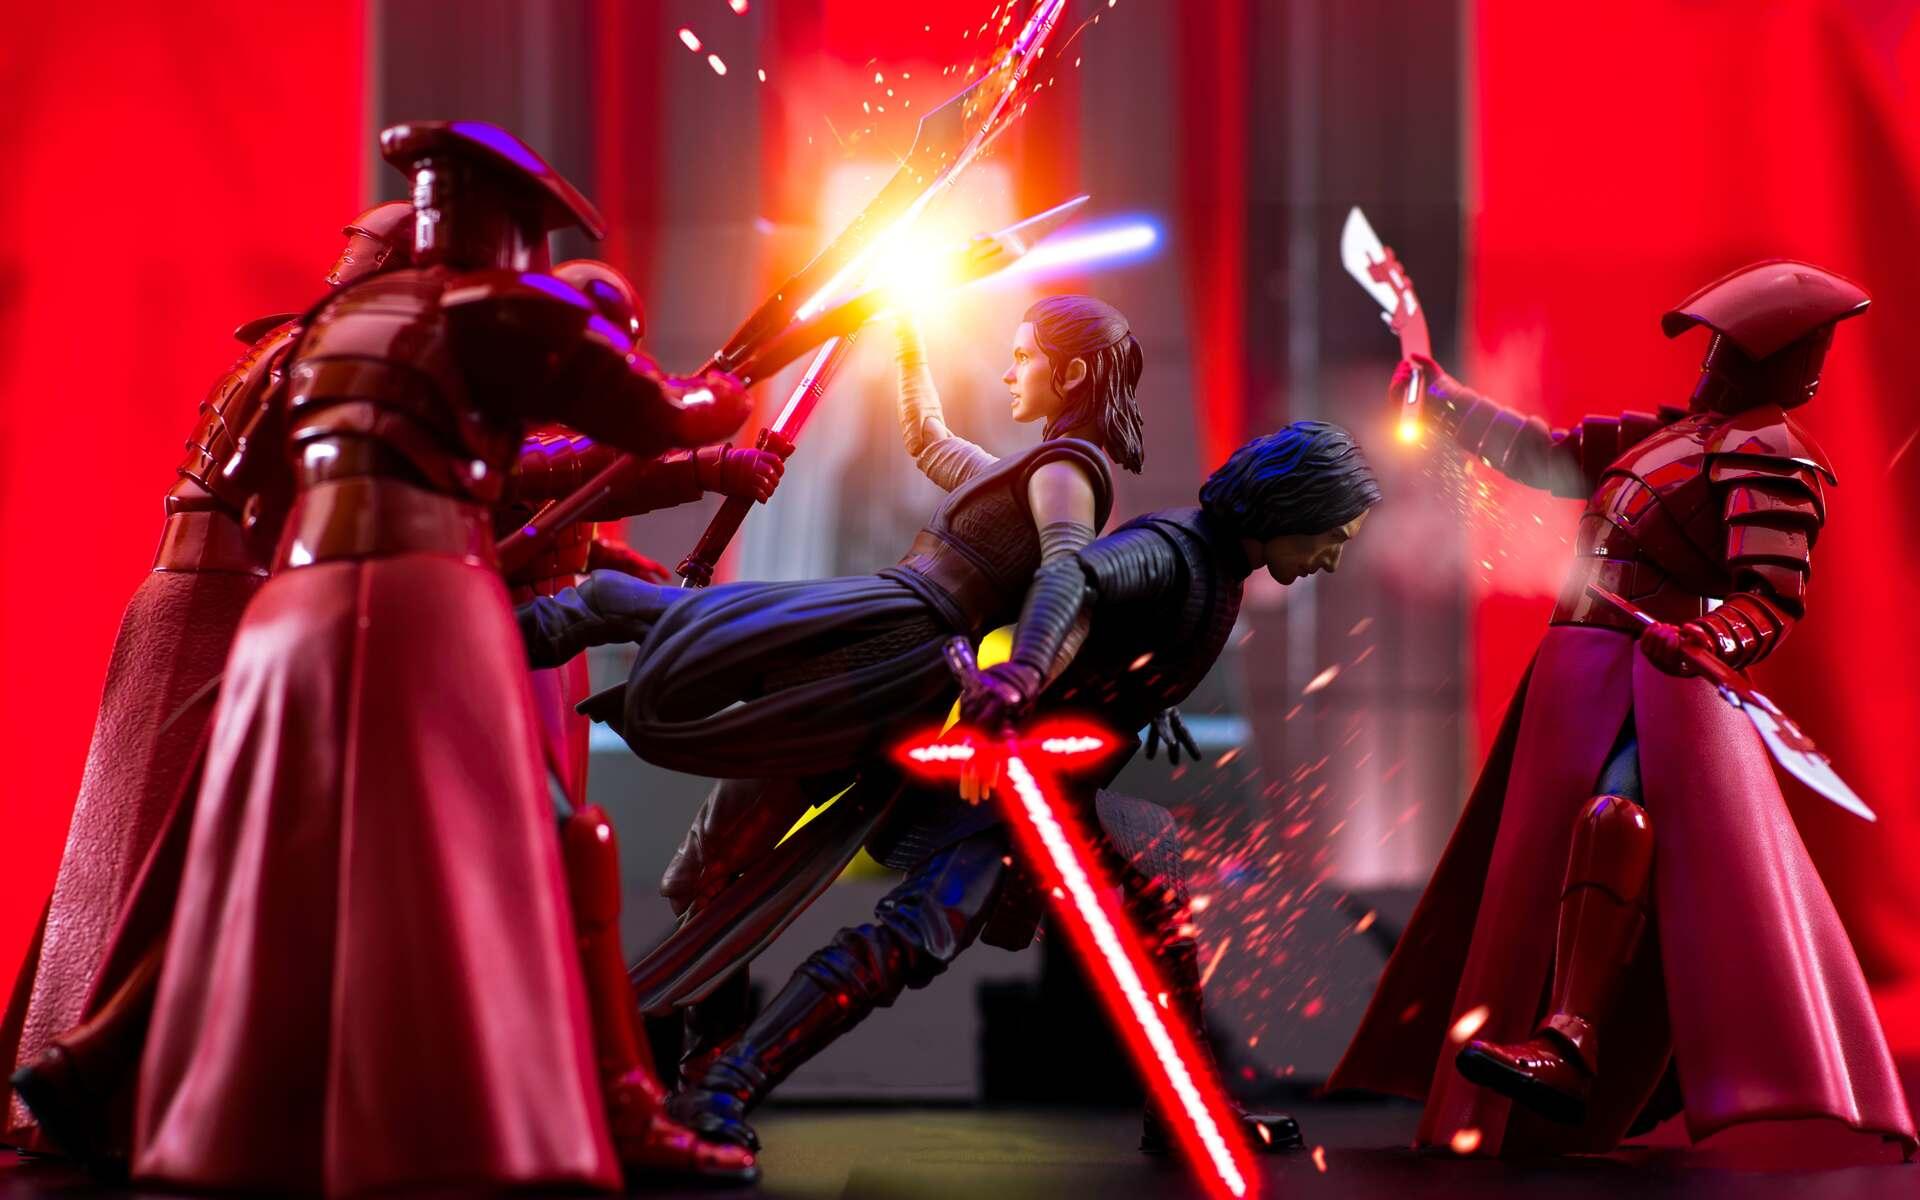 rey-kylo-ren-in-star-wars-the-last-jedi-mf.jpg